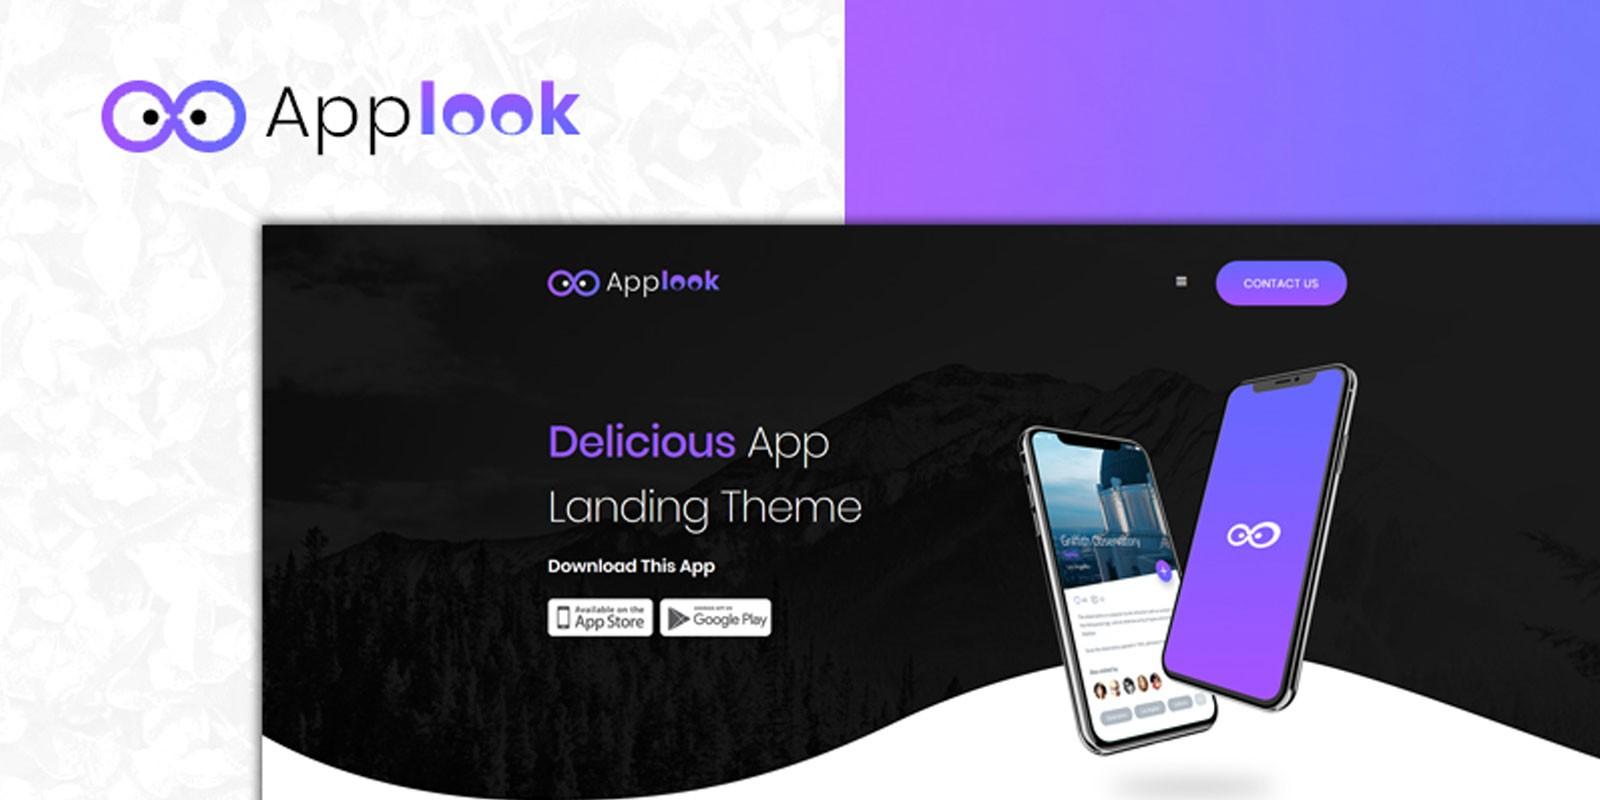 Applook:紫色黑色主题自适应手机应用APP介绍着陆页html模板